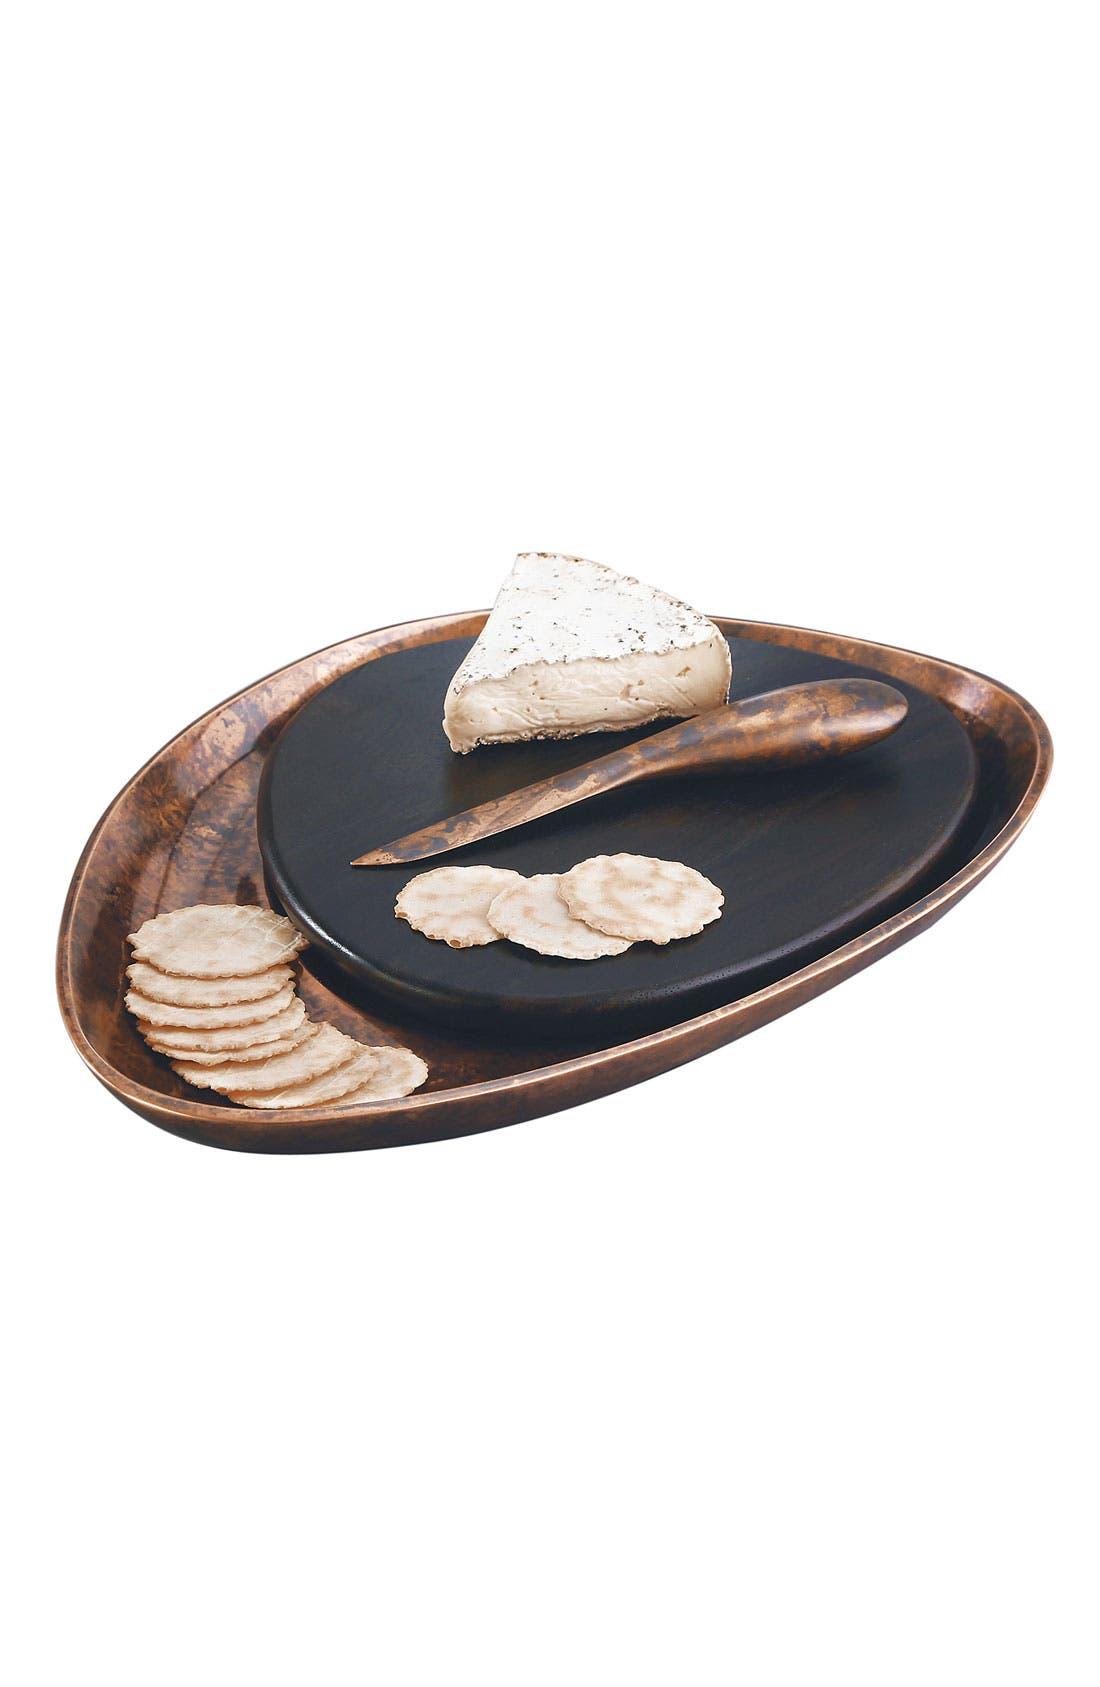 Alternate Image 2  - Nambé 'Pebble' Cheeseboard